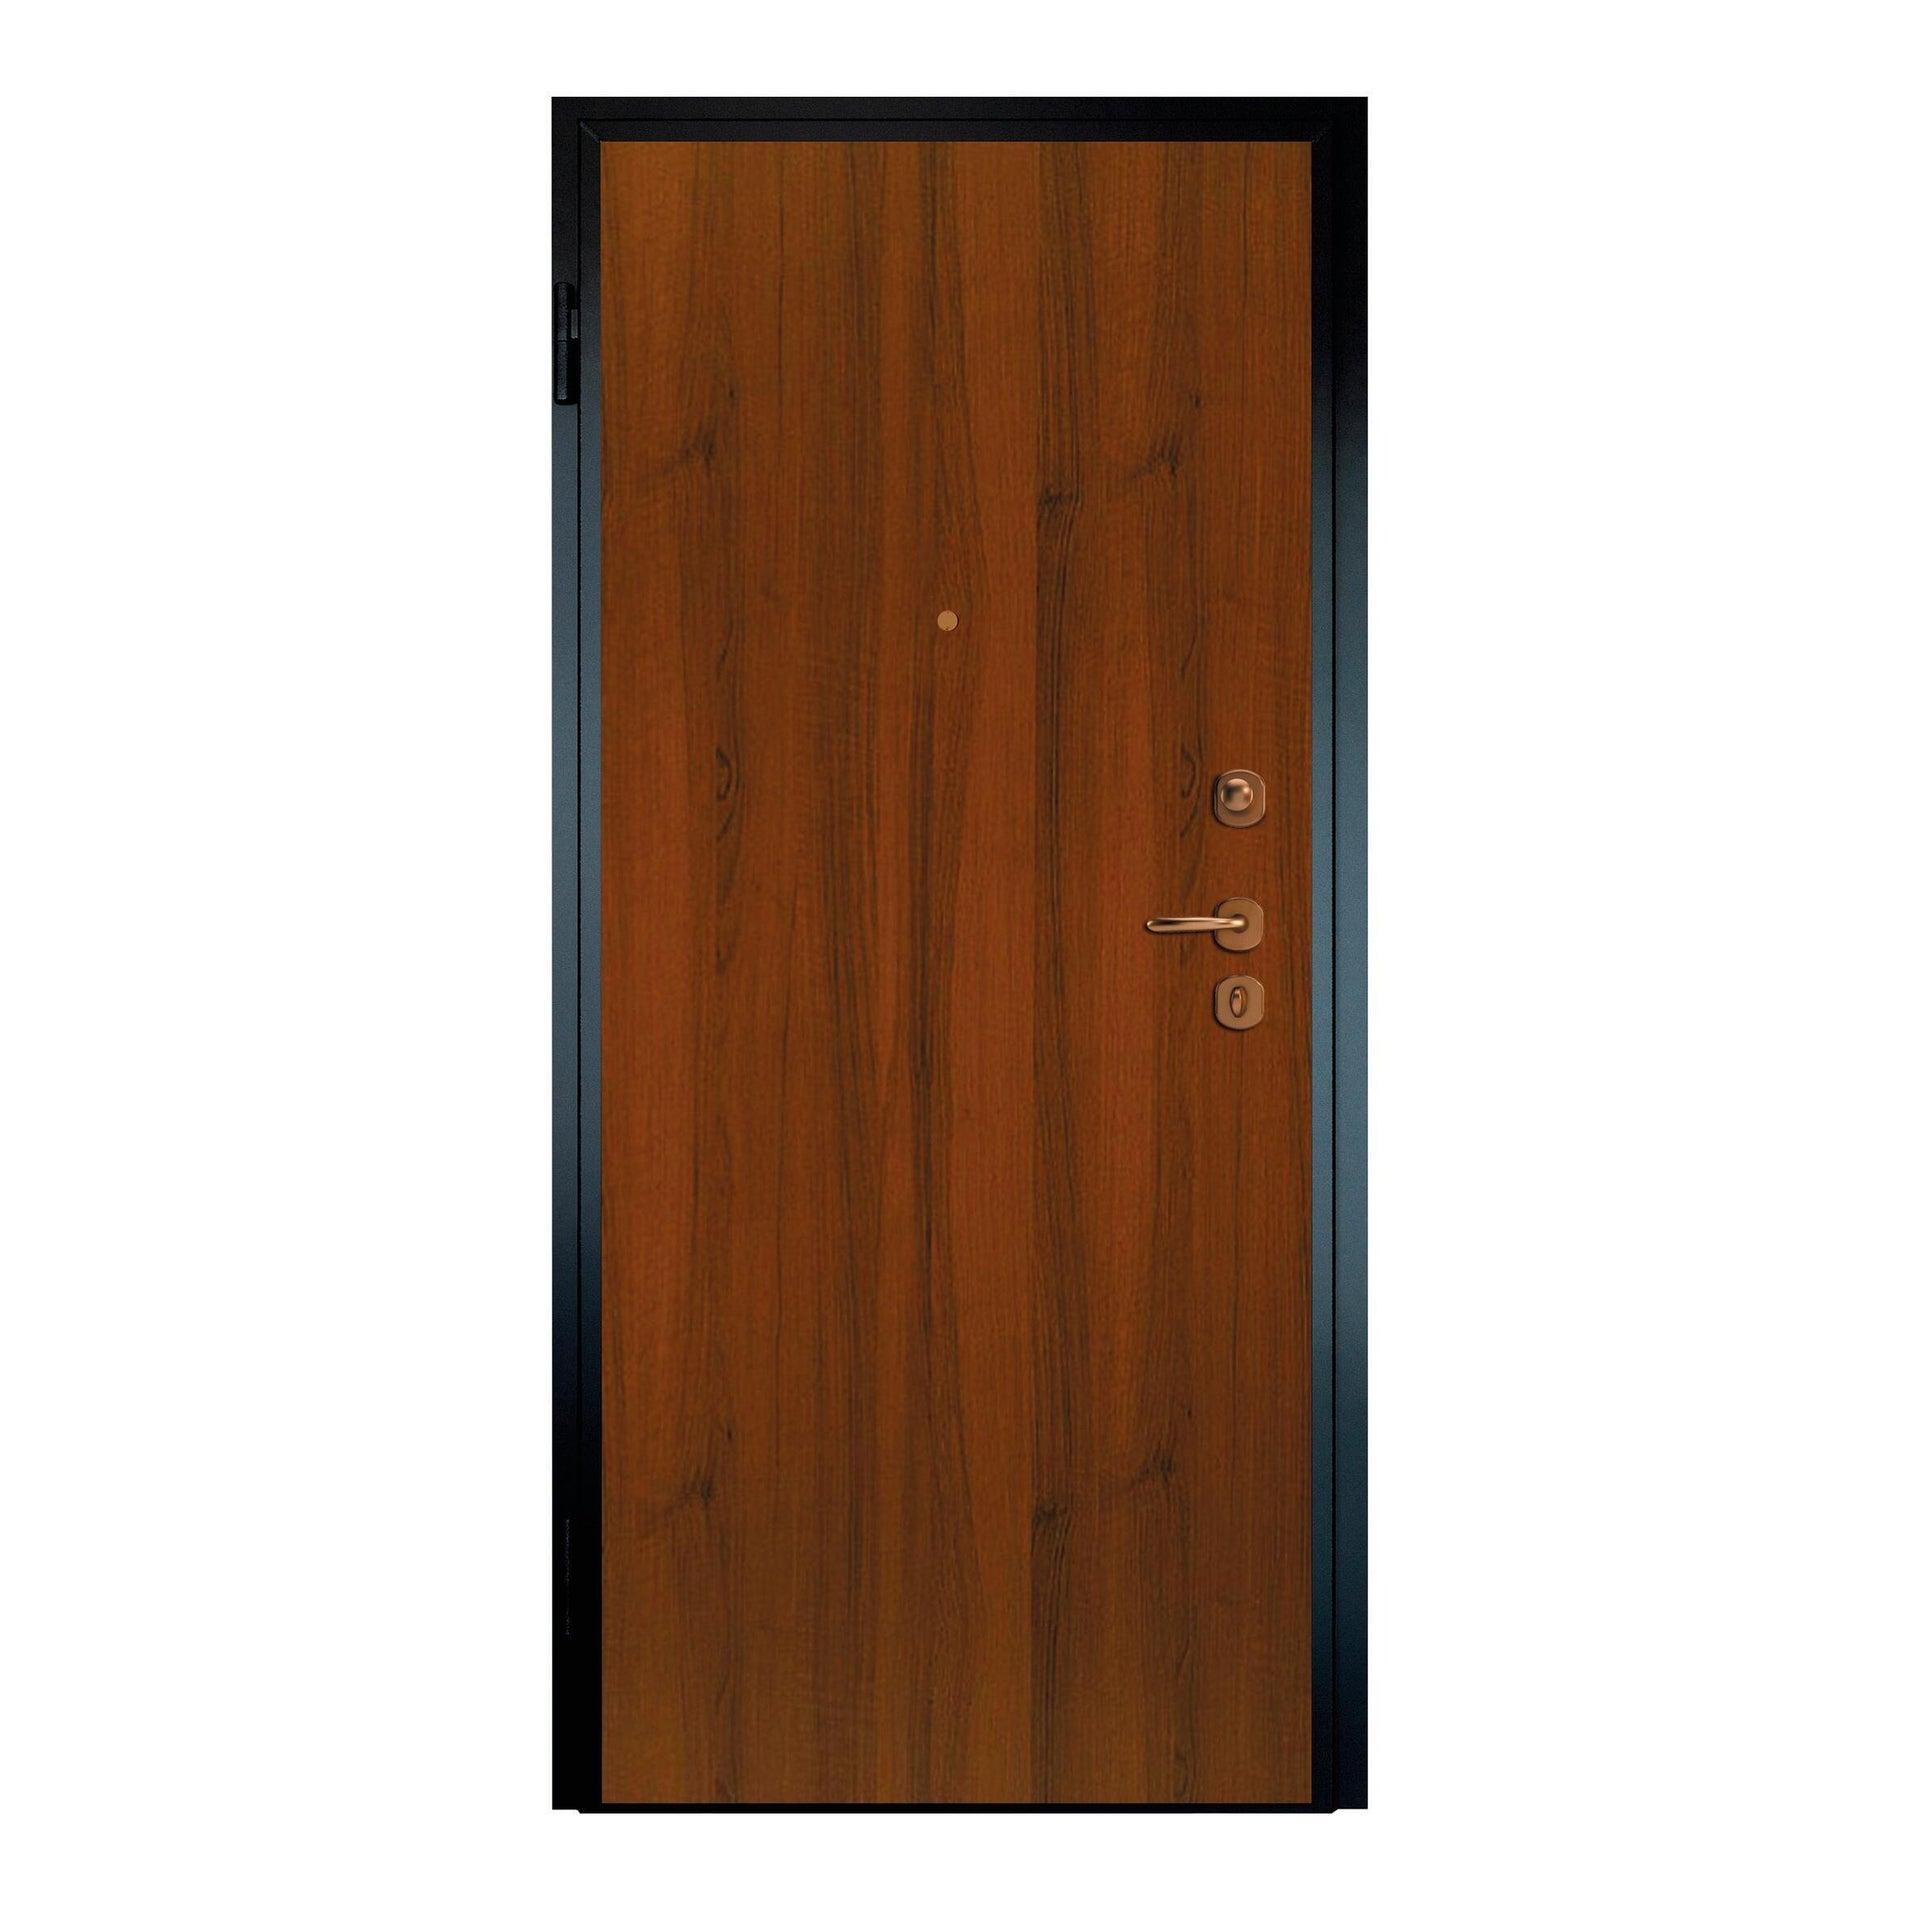 Porta blindata Super noce L 90 x H 210 cm sinistra - 1